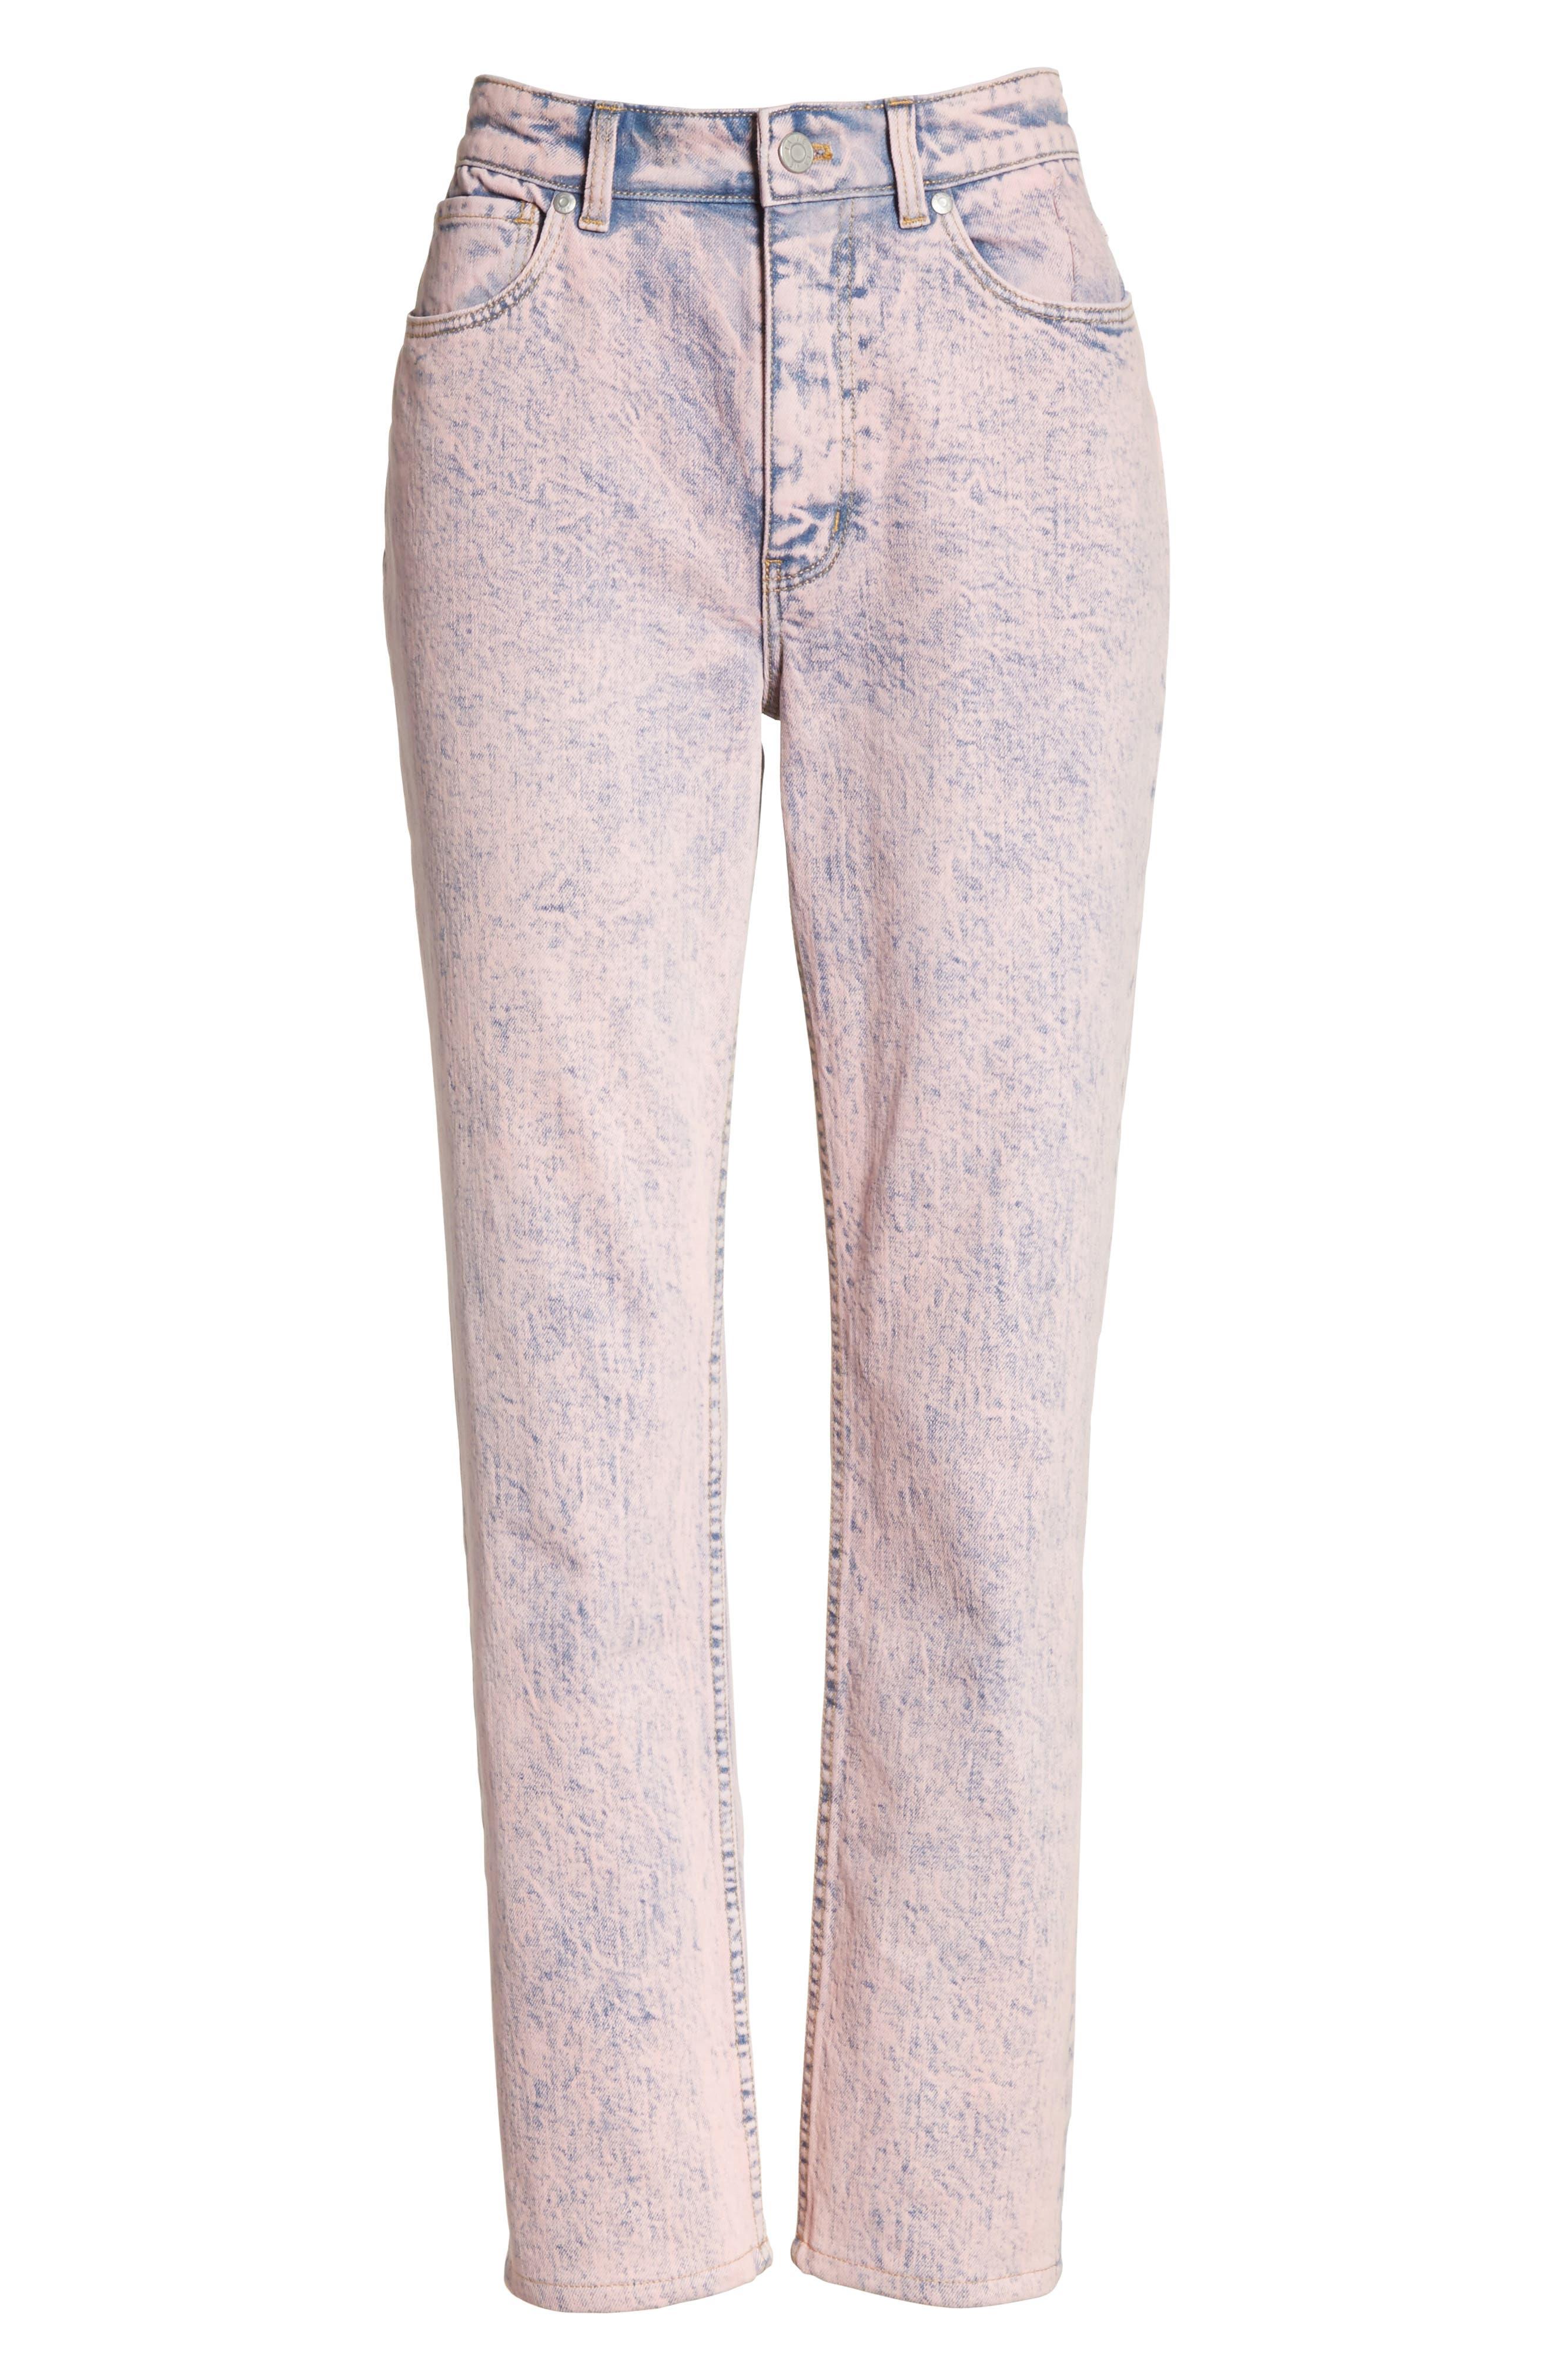 Ines Acid Wash Crop Jeans,                             Alternate thumbnail 6, color,                             Pink Overdyed Acid Wash